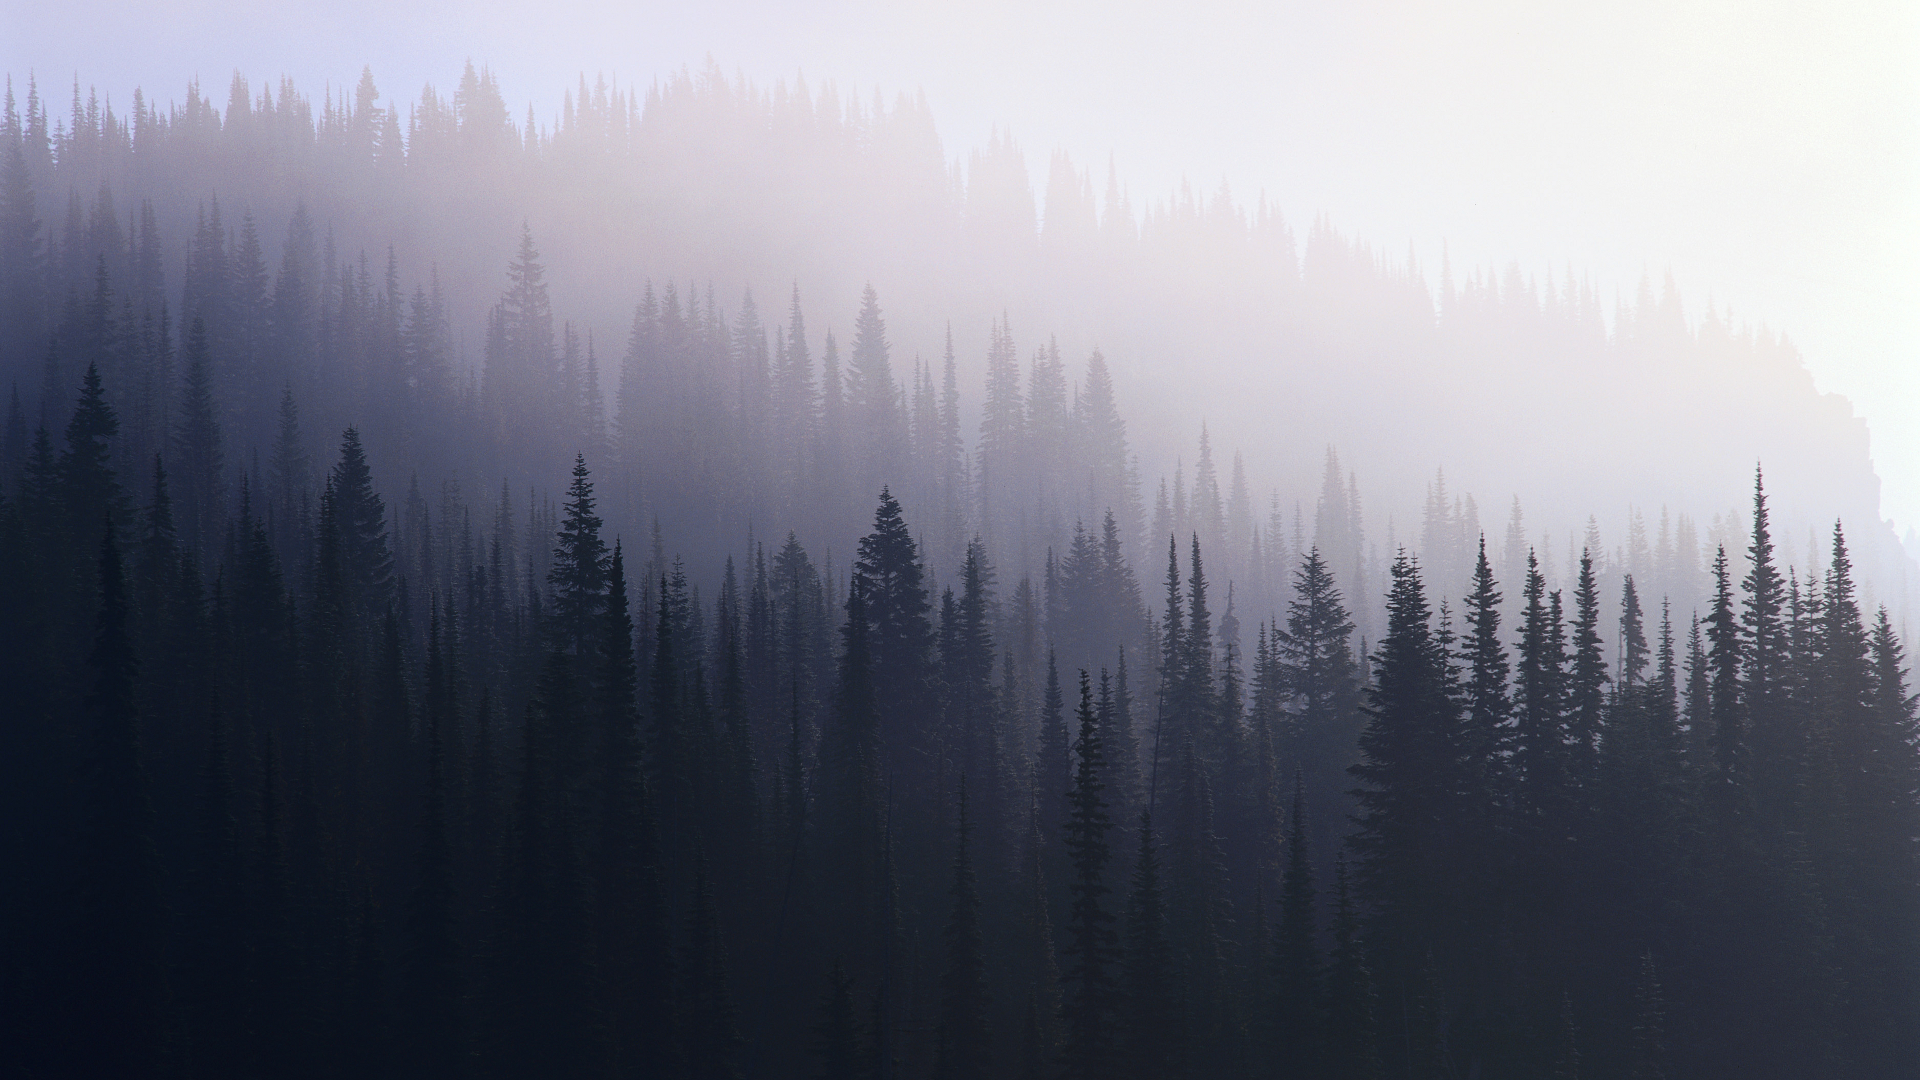 Foggy Forest Wallpaper - WallpaperSafari